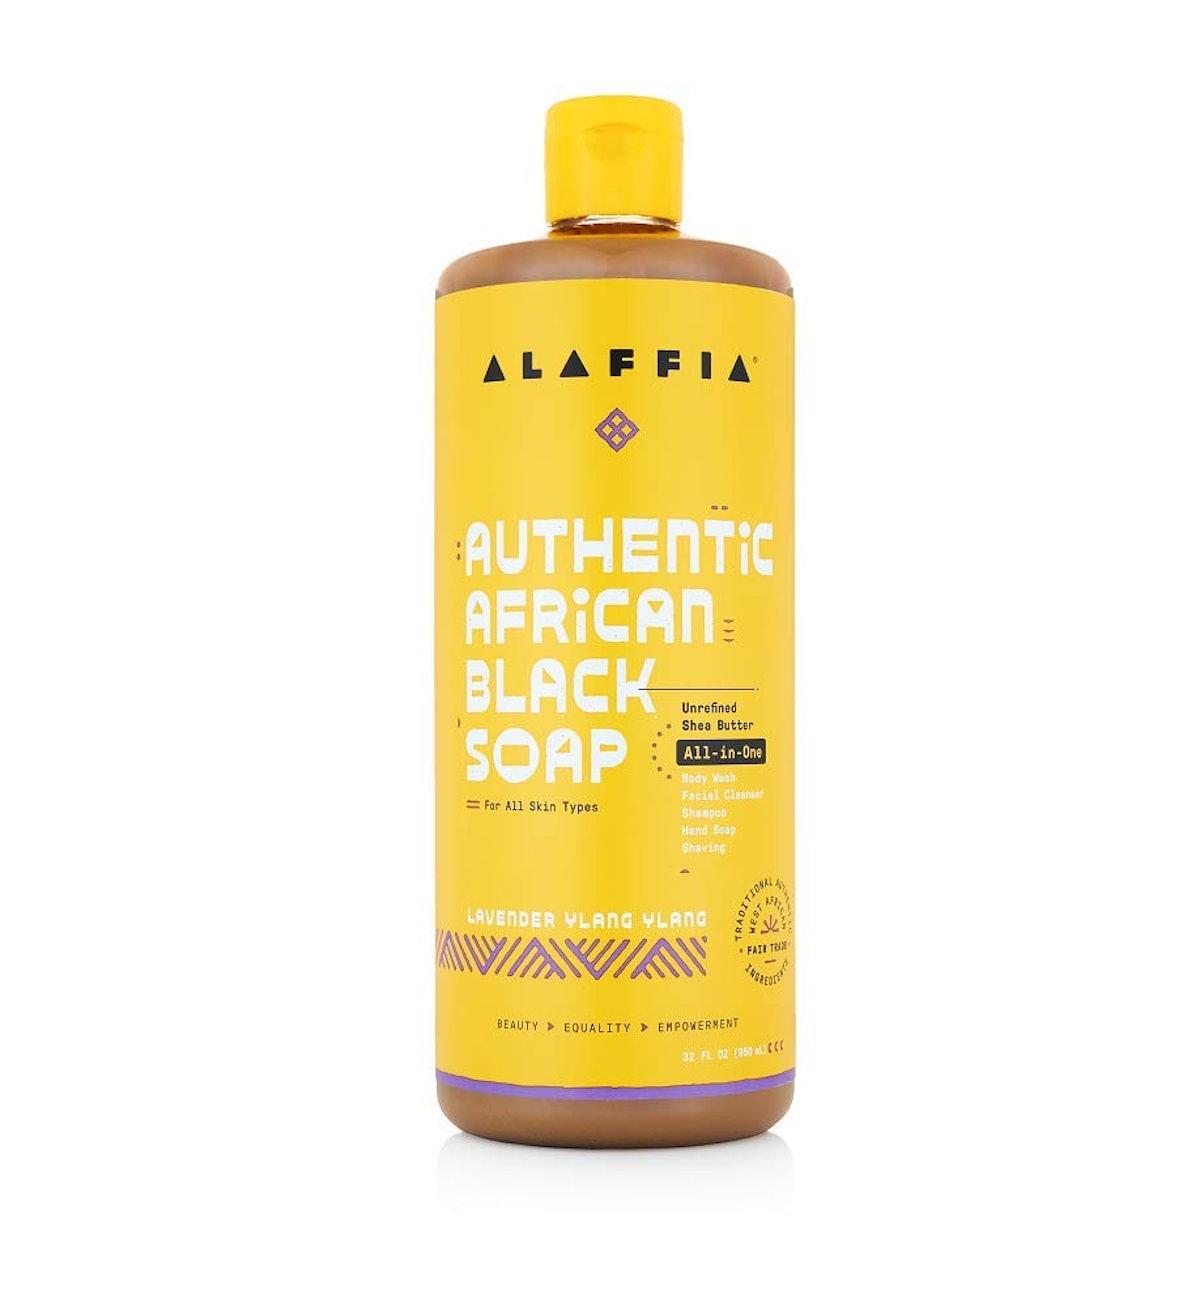 Alaffia Authentic African Black Soap in Lavender Ylang Ylang